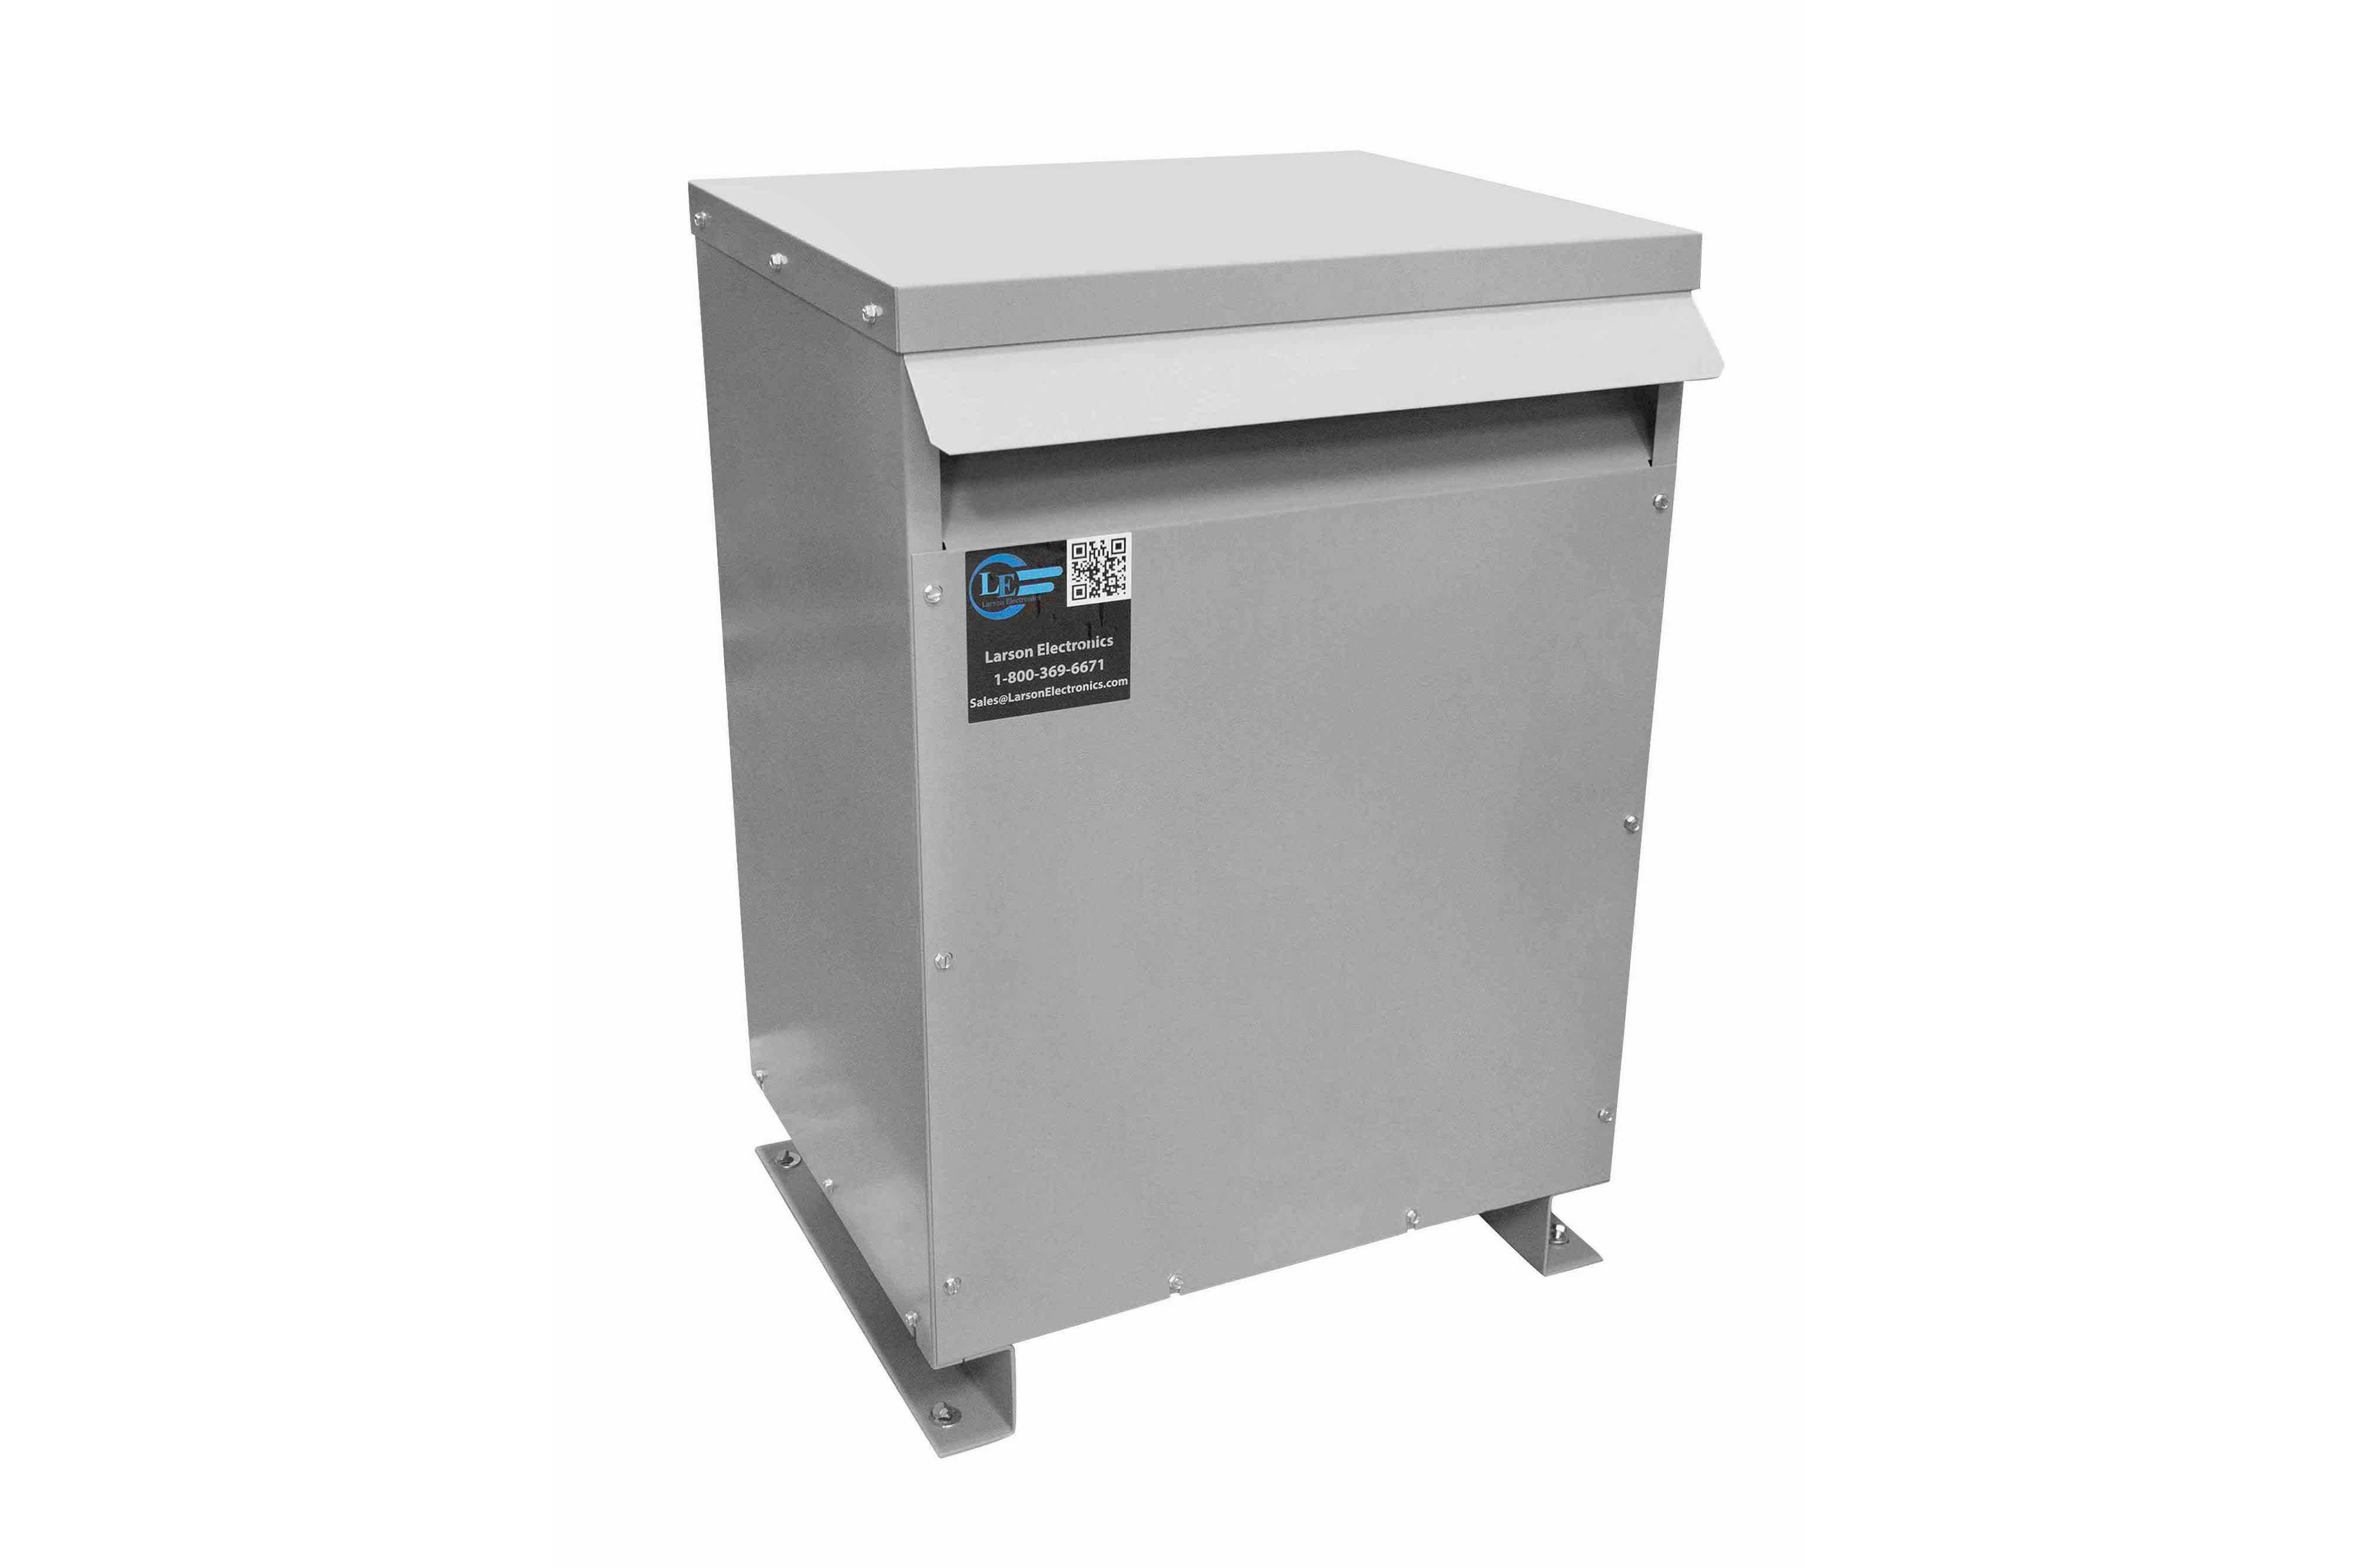 700 kVA 3PH DOE Transformer, 400V Delta Primary, 600Y/347 Wye-N Secondary, N3R, Ventilated, 60 Hz